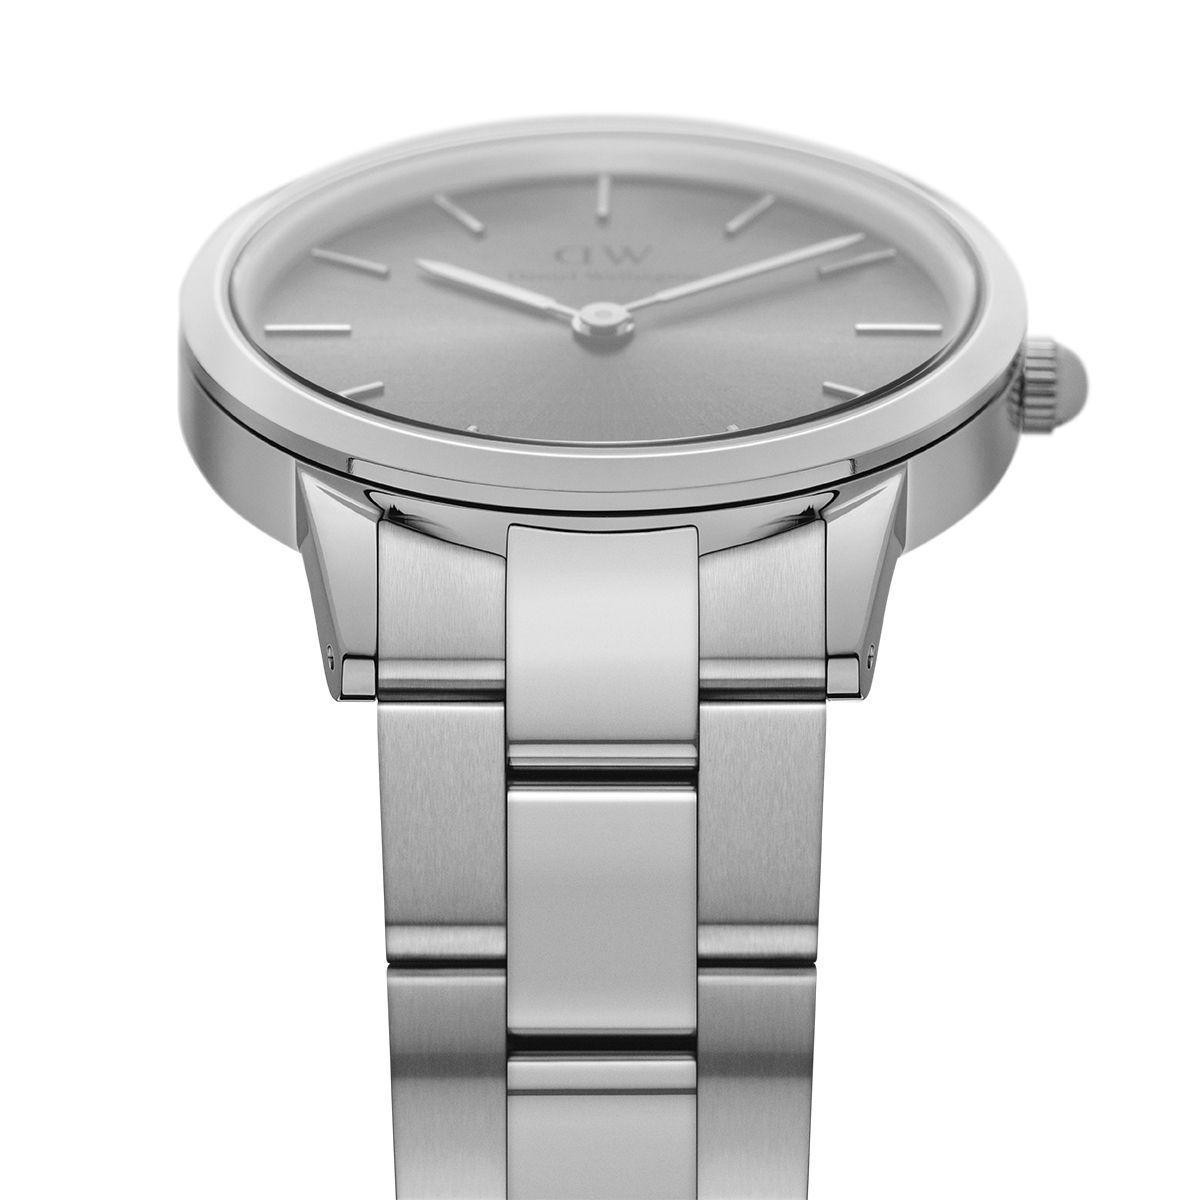 dw官网 dw手表官网 dw中国官网 dw官方旗舰店 DW DW官网  Watch Iconic Link Silver Grey 36mm